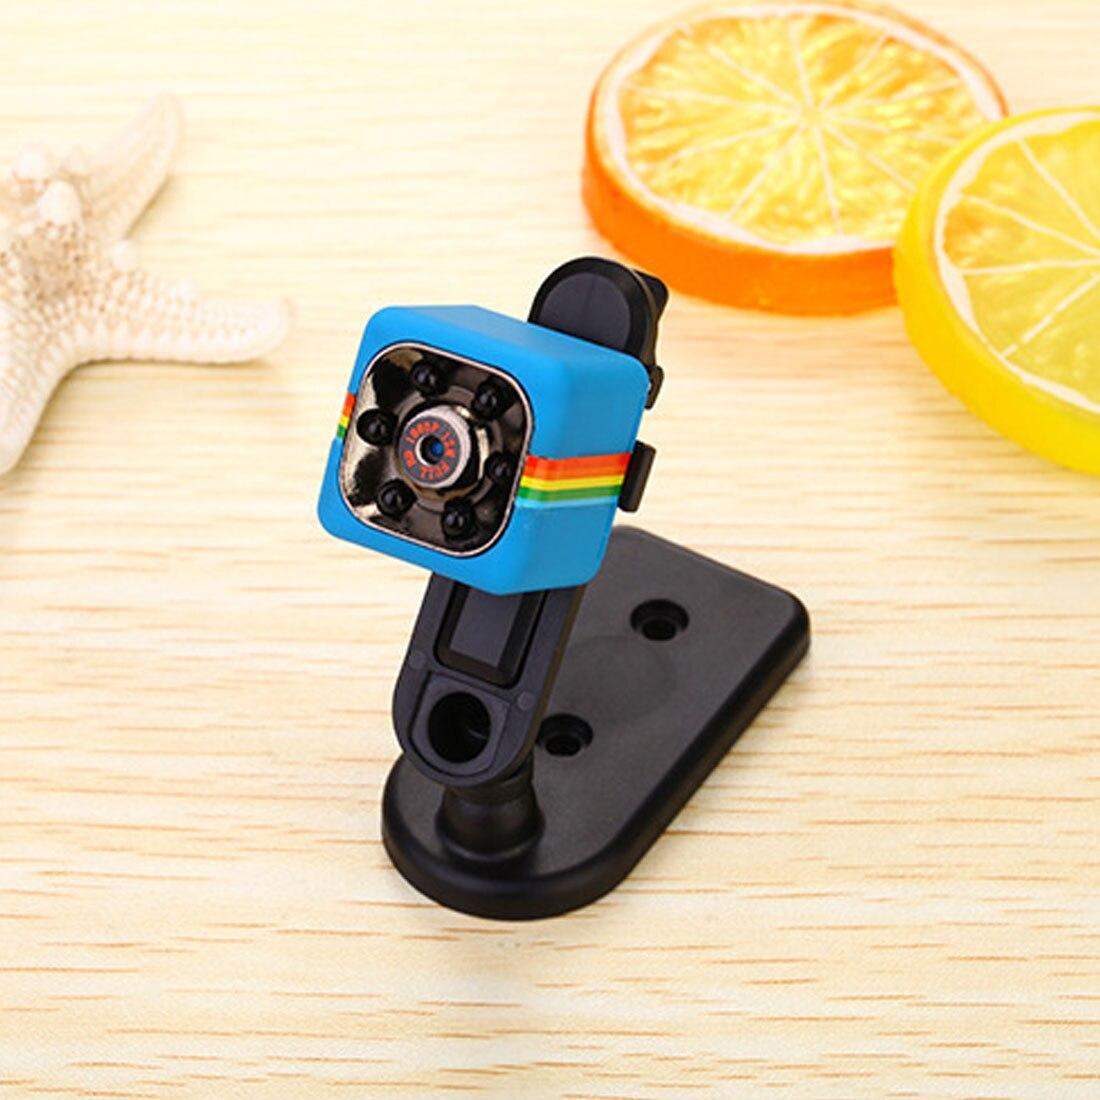 HONGDAK Carino Mini Macchina Fotografica SQ11 HD 1080 P Camcorder Visione Notturna di HD Mini Macchina Fotografica Aerea Sport Mini DV Voice Video Record